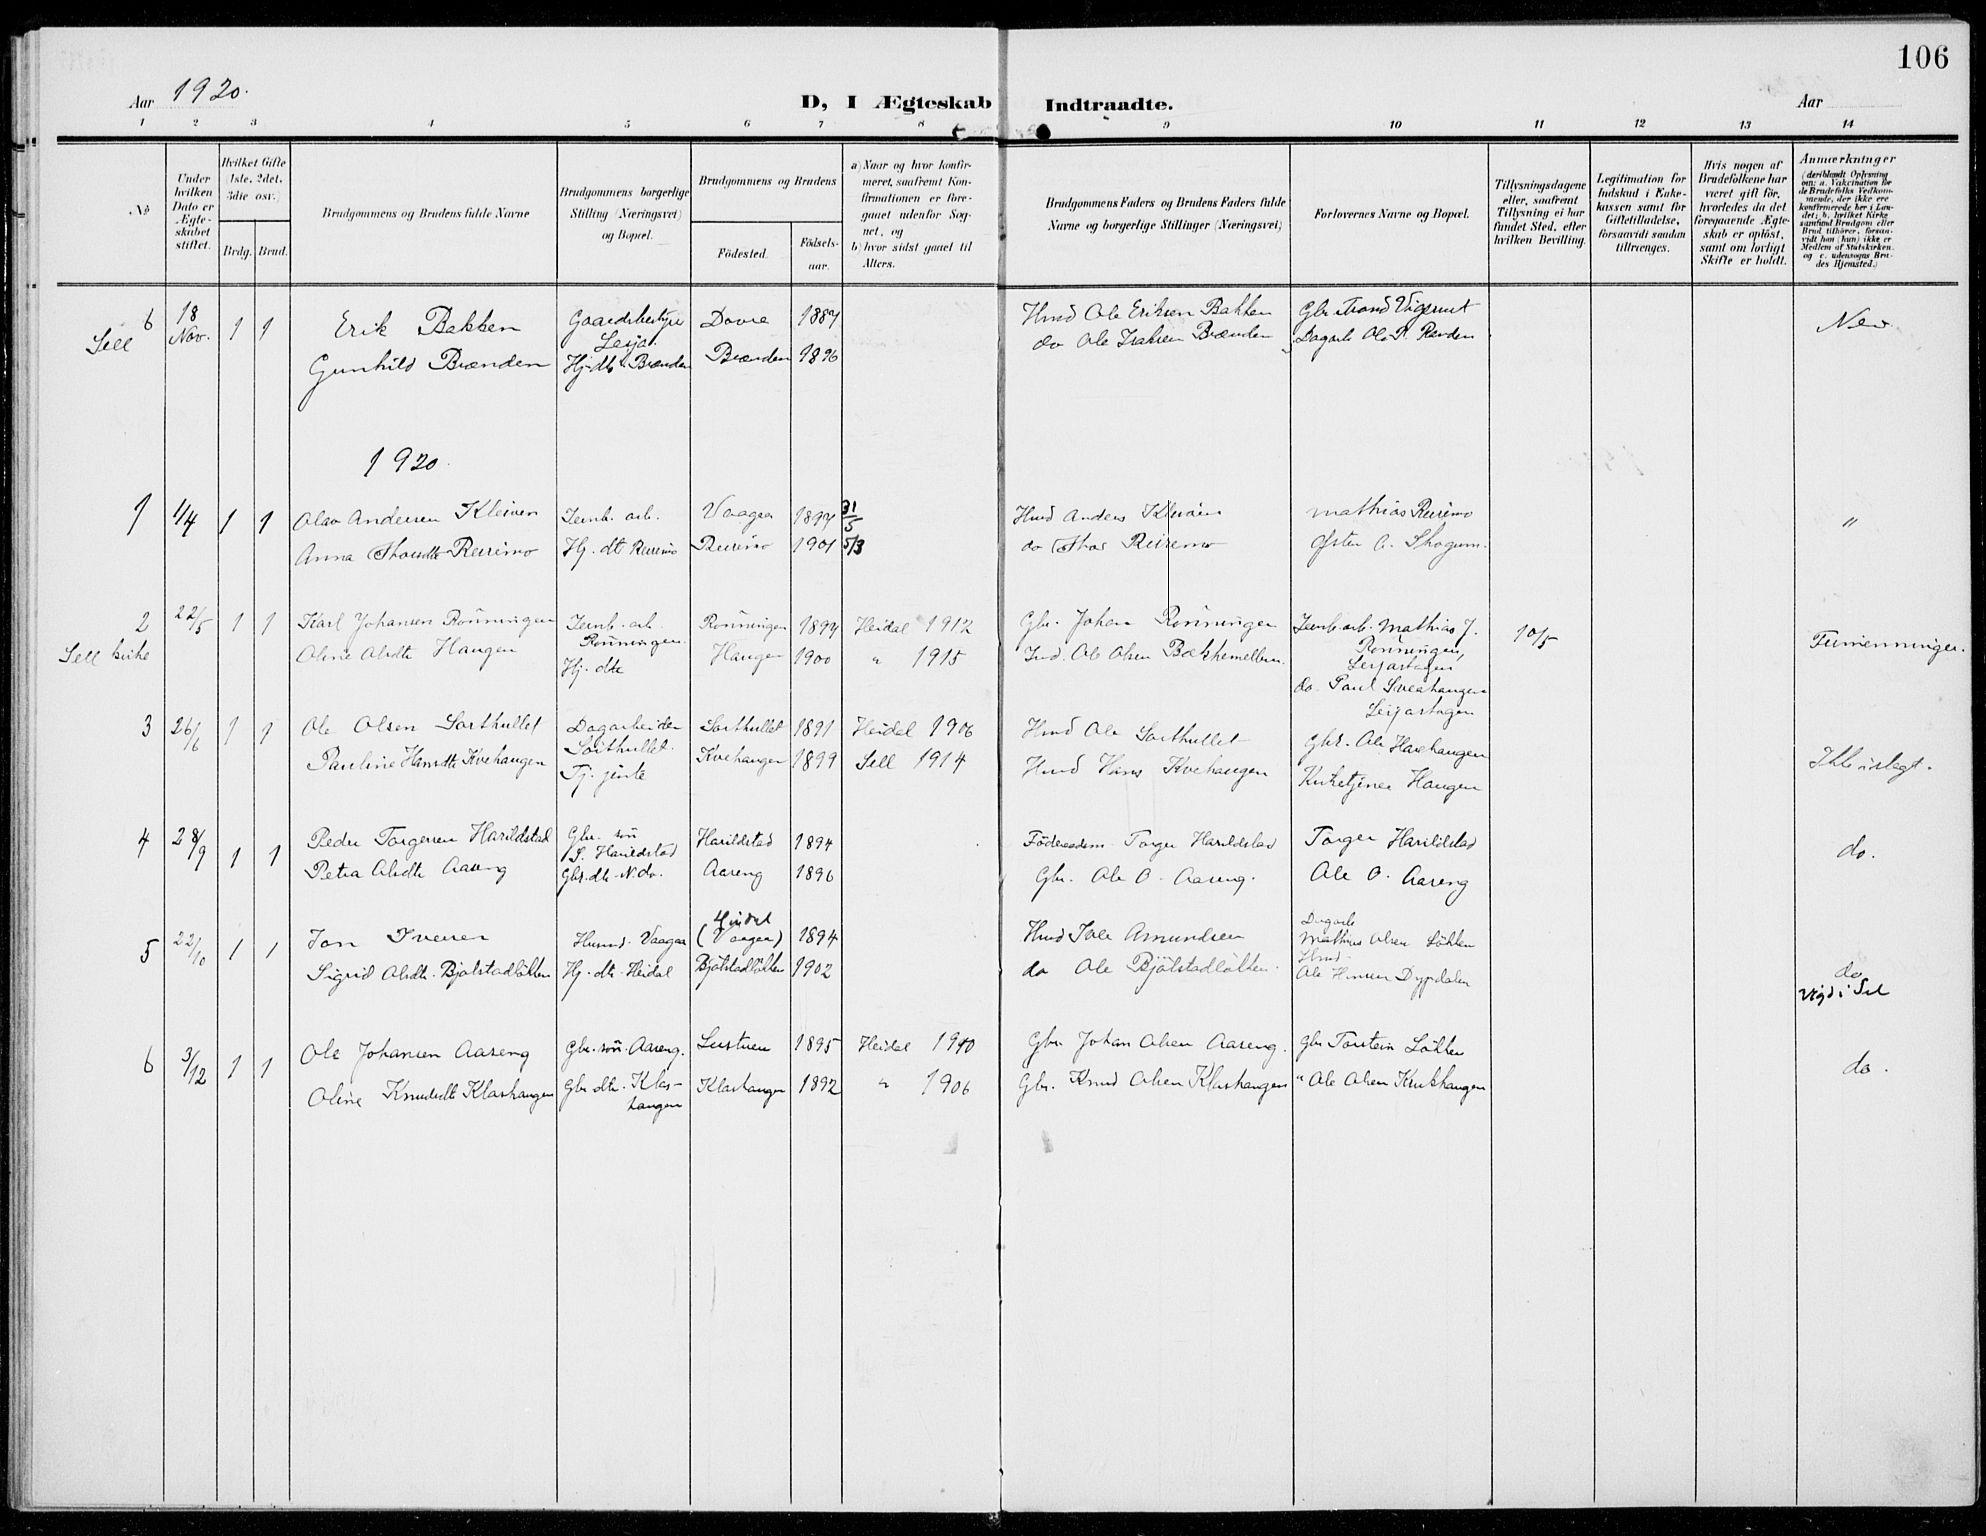 SAH, Sel prestekontor, Ministerialbok nr. 1, 1905-1922, s. 106